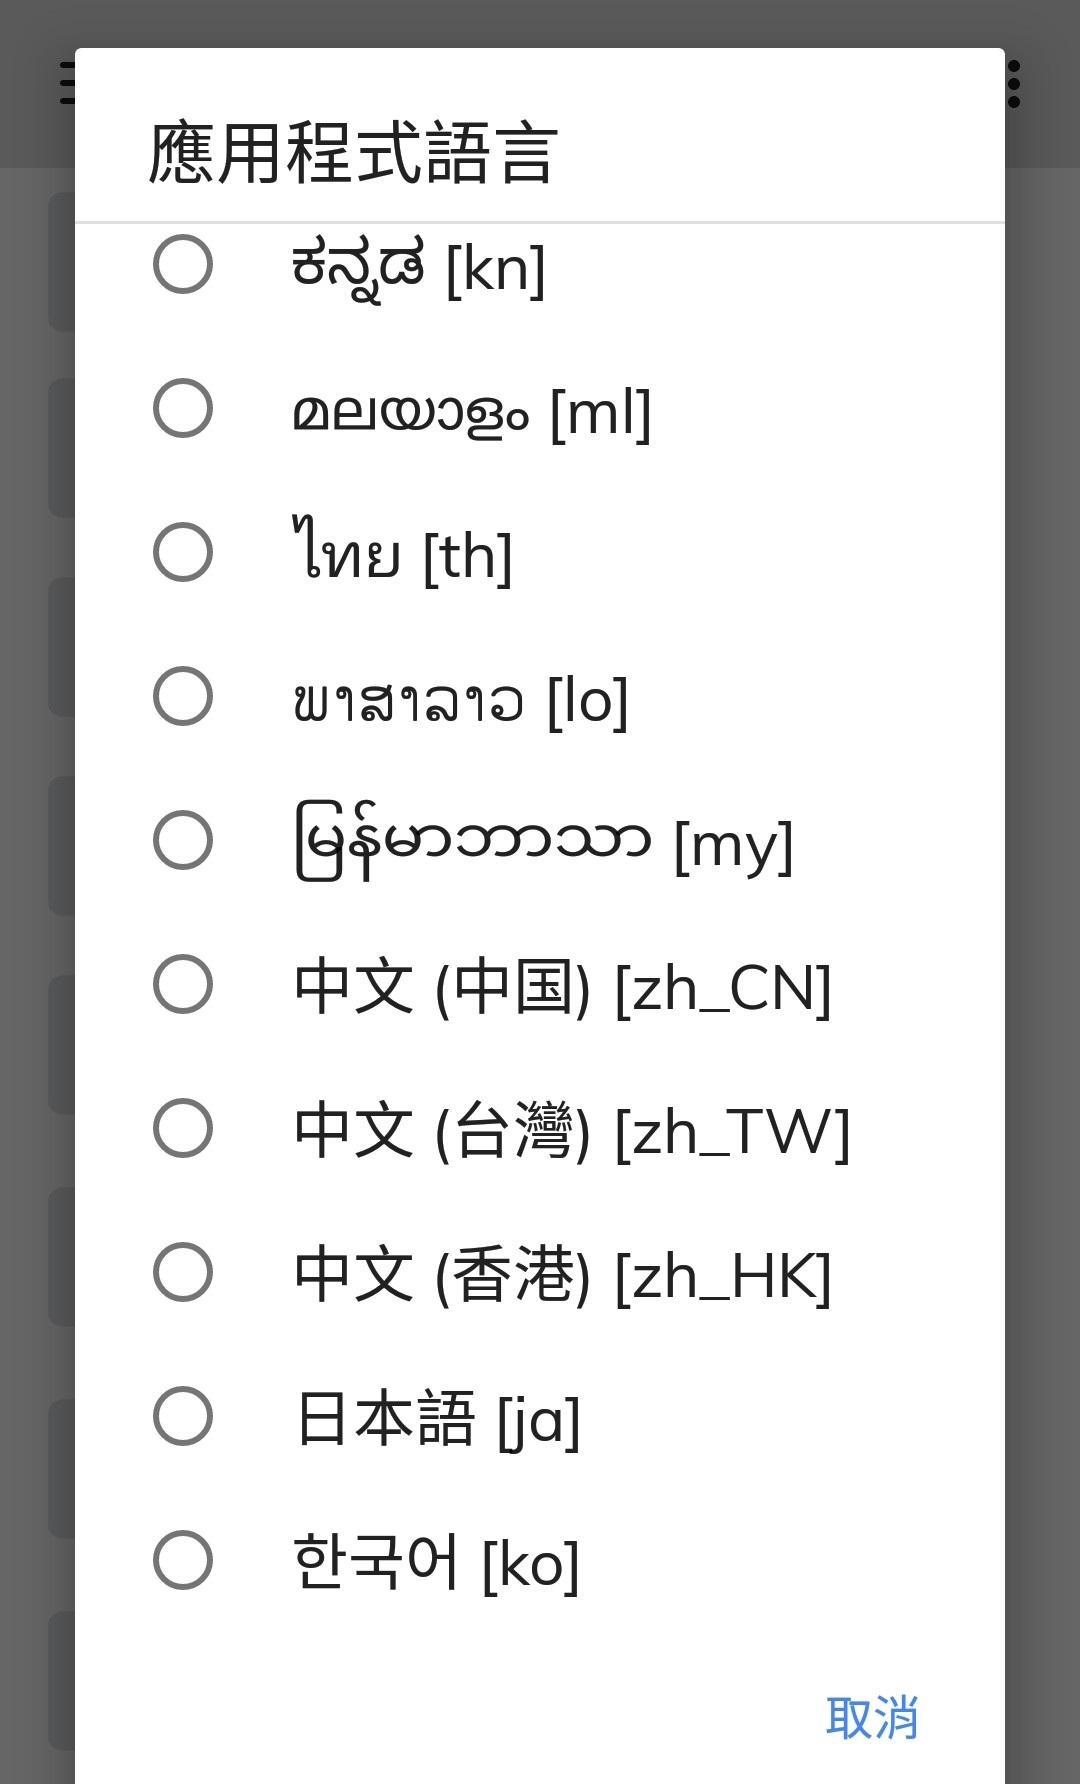 quicktime player 繁體 中文 版